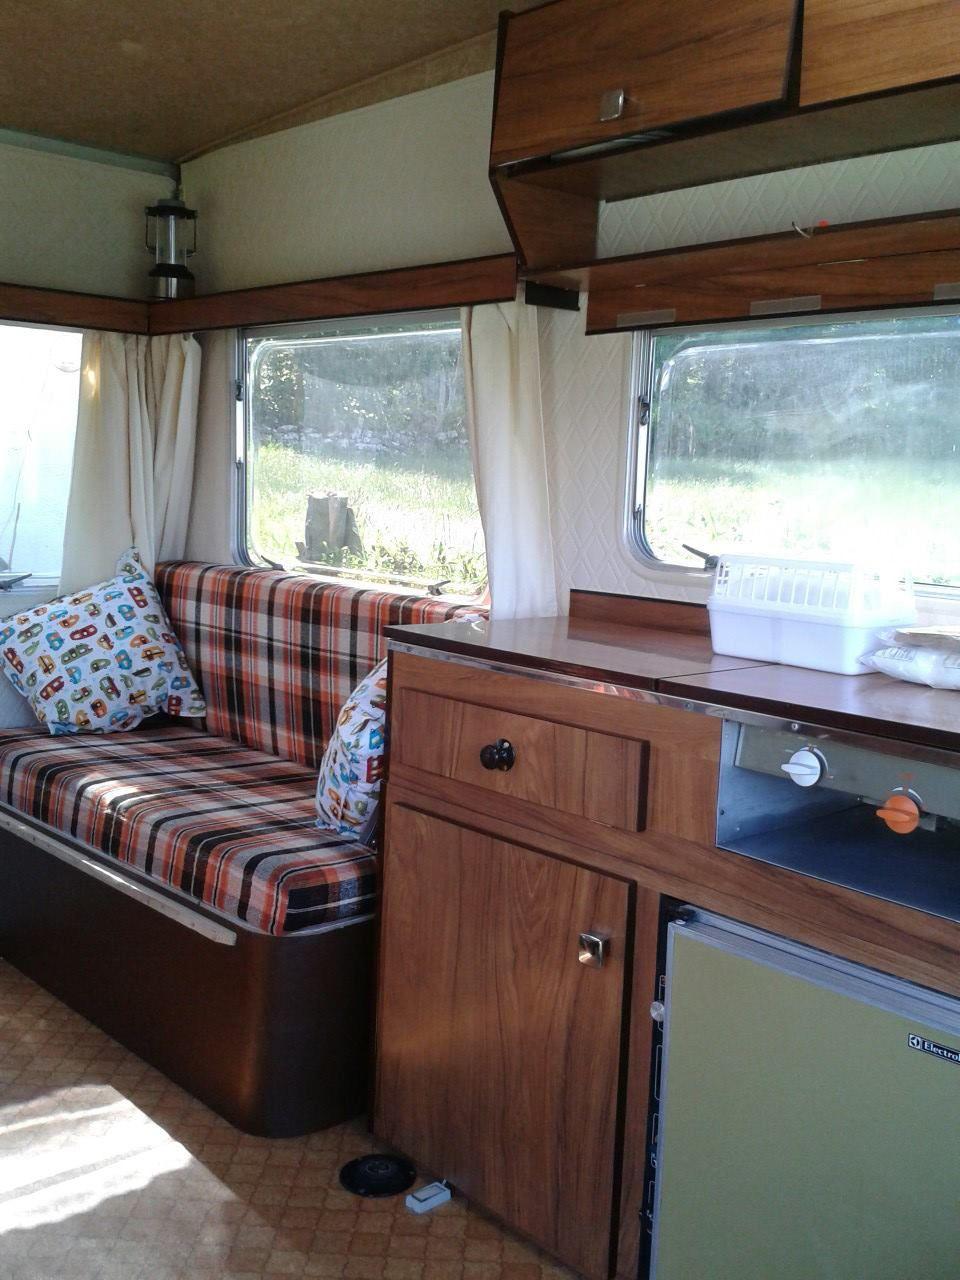 esterel folding caravan interior esterel folding caravans pinterest airstream flying cloud. Black Bedroom Furniture Sets. Home Design Ideas